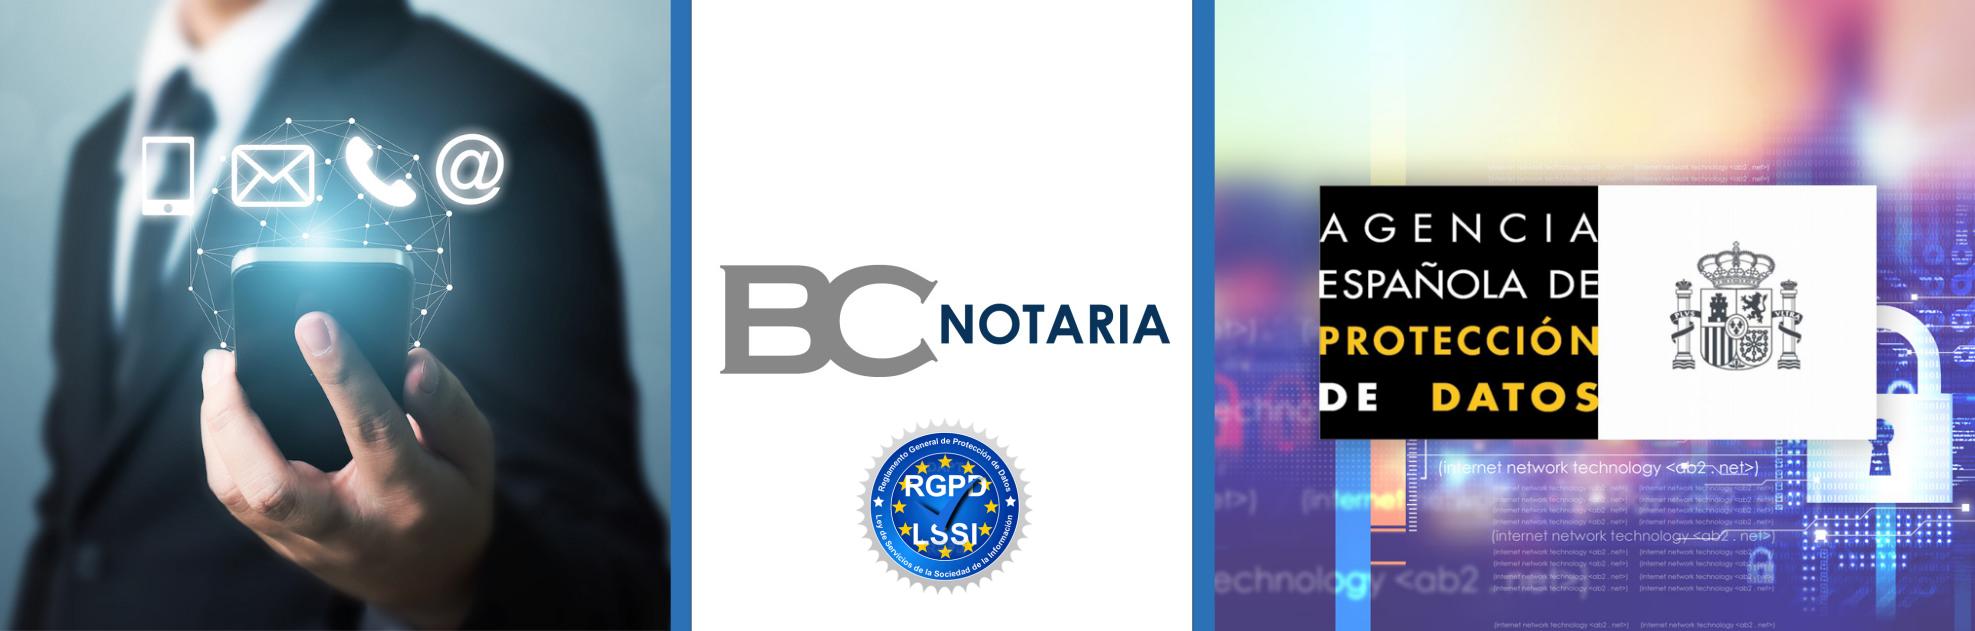 Gestión RGPD BcNotaria